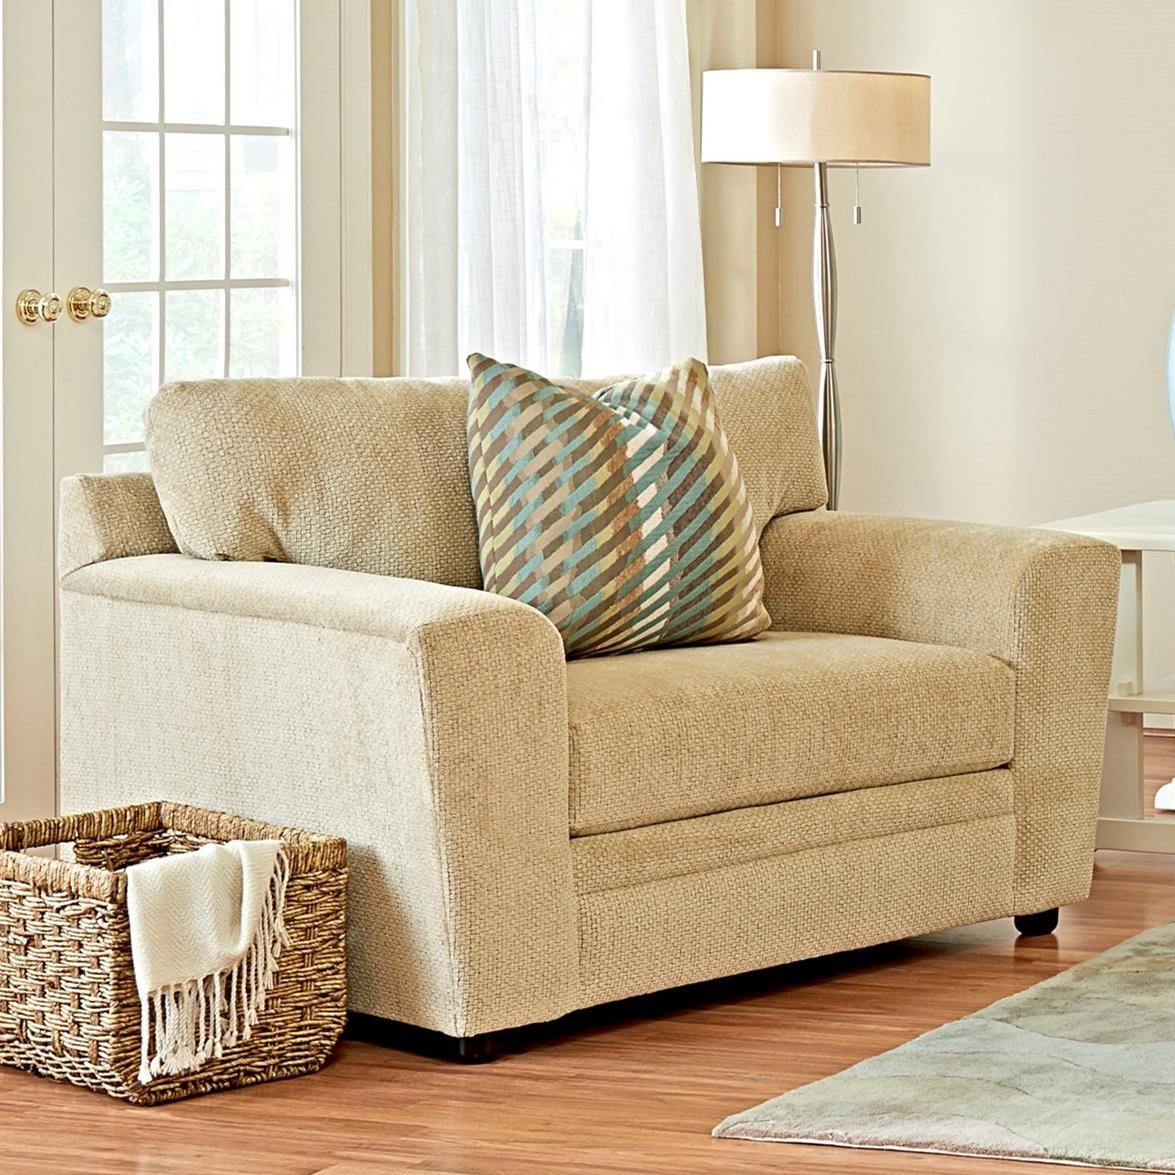 Klaussner Ashburn Oversized Chair - Item Number: K67400 C